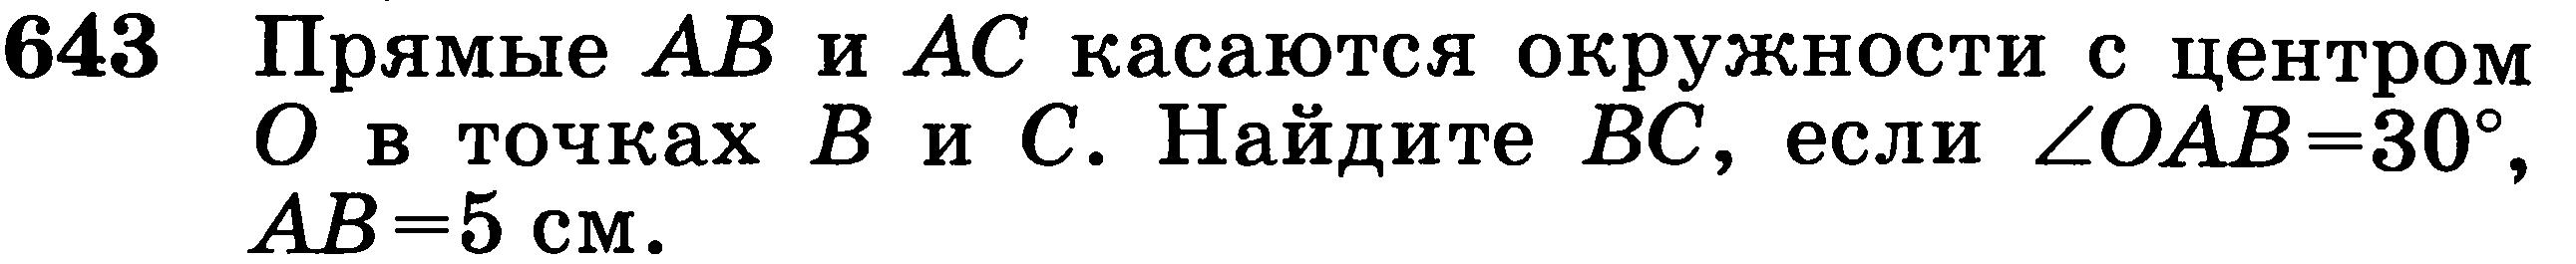 hello_html_m305dc0ec.png